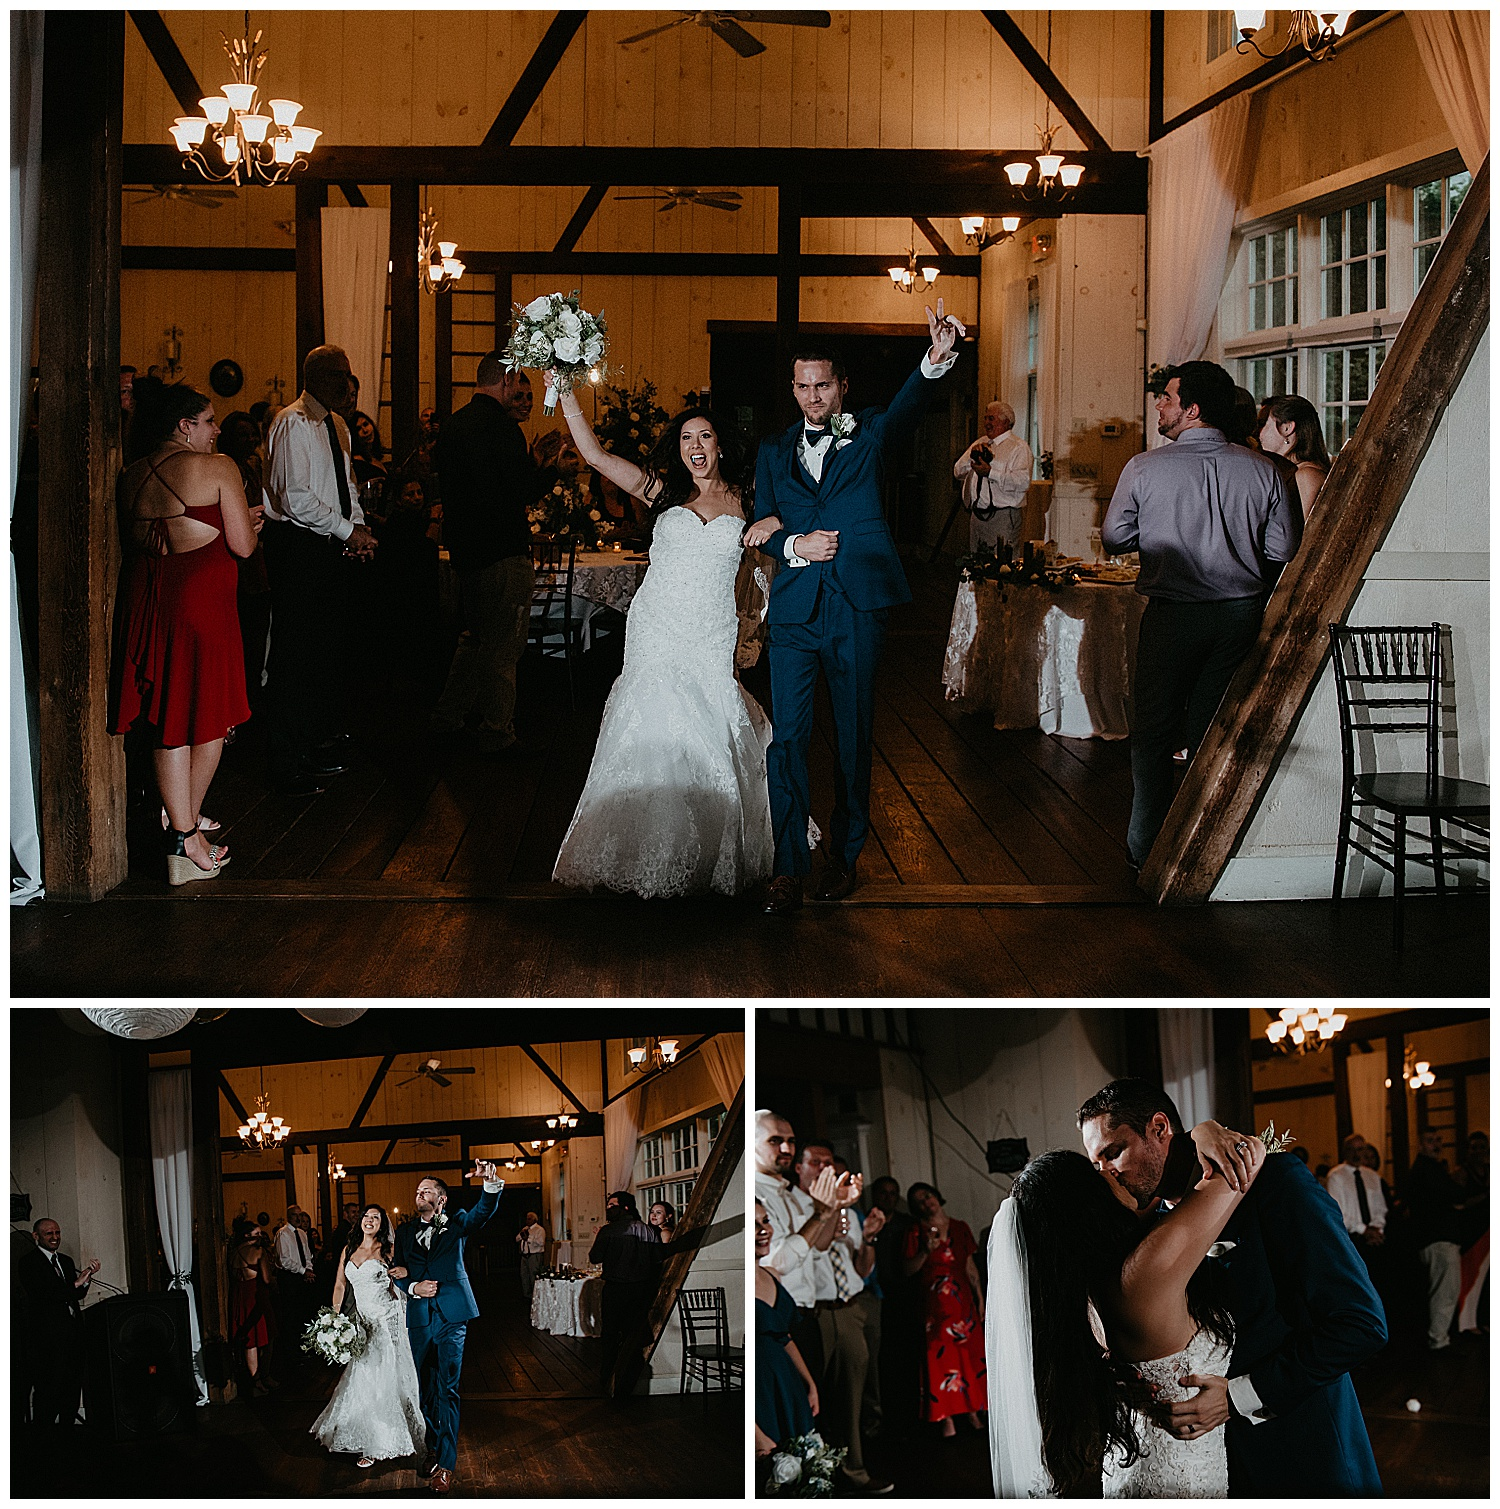 NEPA-Bloomsburg-Wedding-Photographer-at-The-Barn-at-Boones-Dam-Bloomsburg-PA_0060.jpg